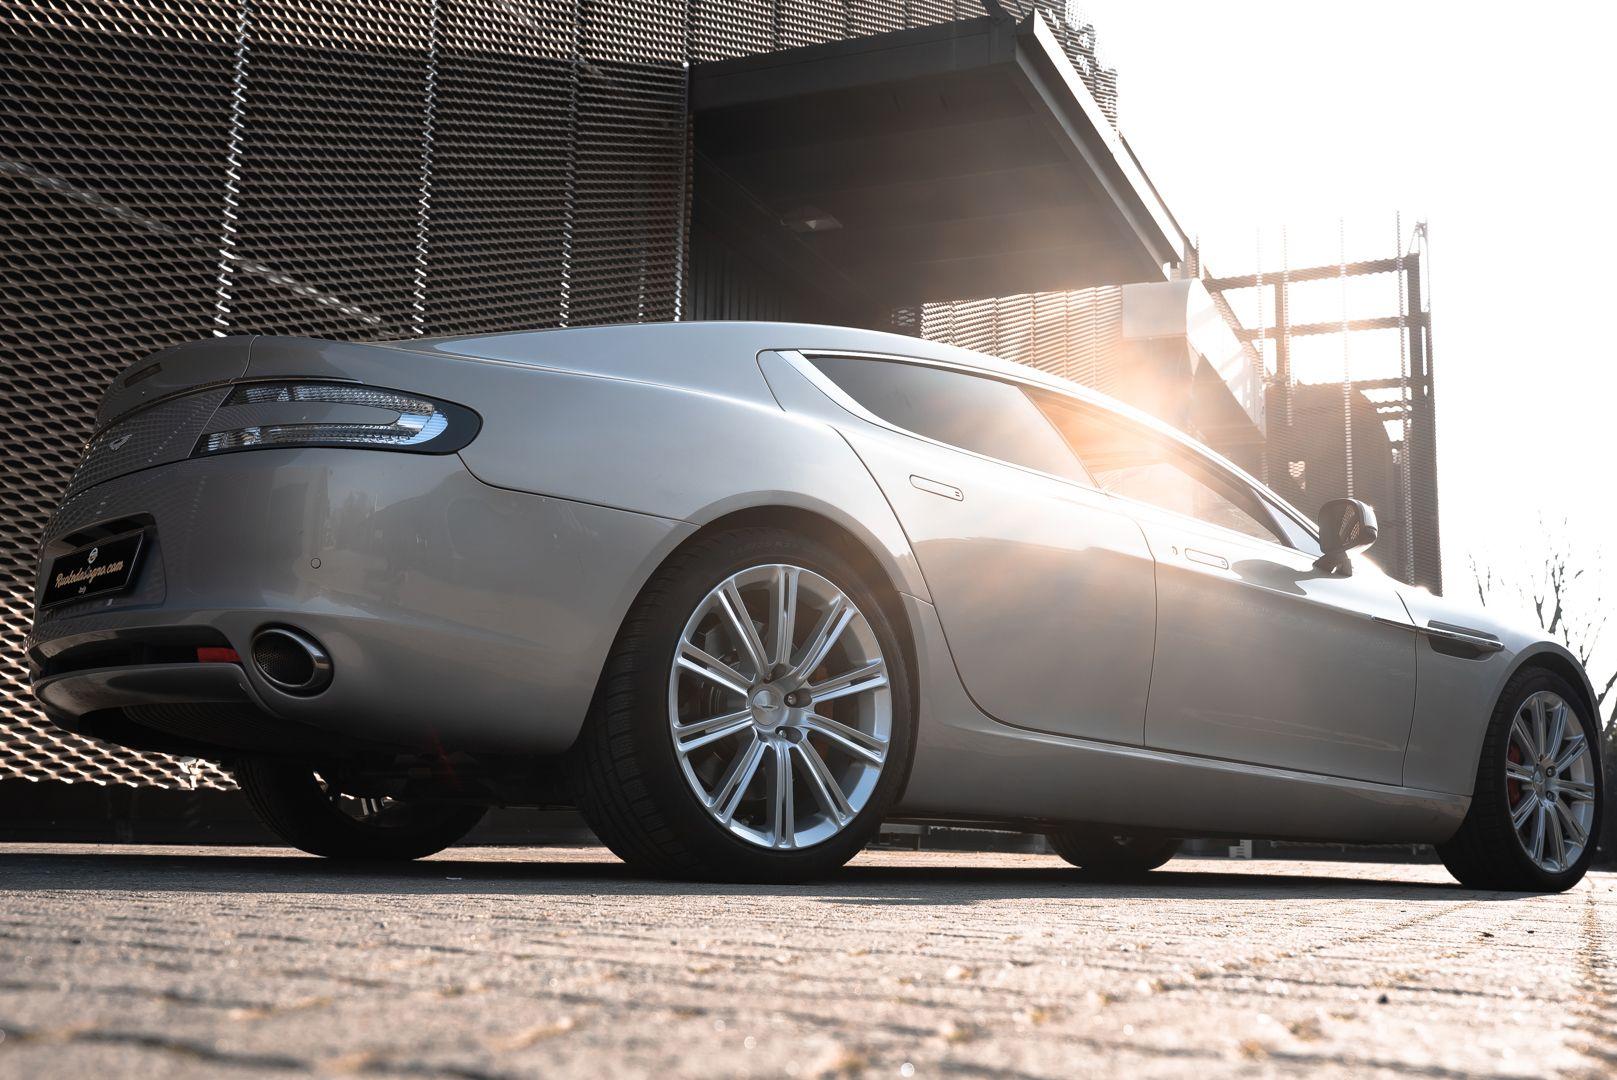 2010 Aston Martin Rapide 6.0 V12 62553